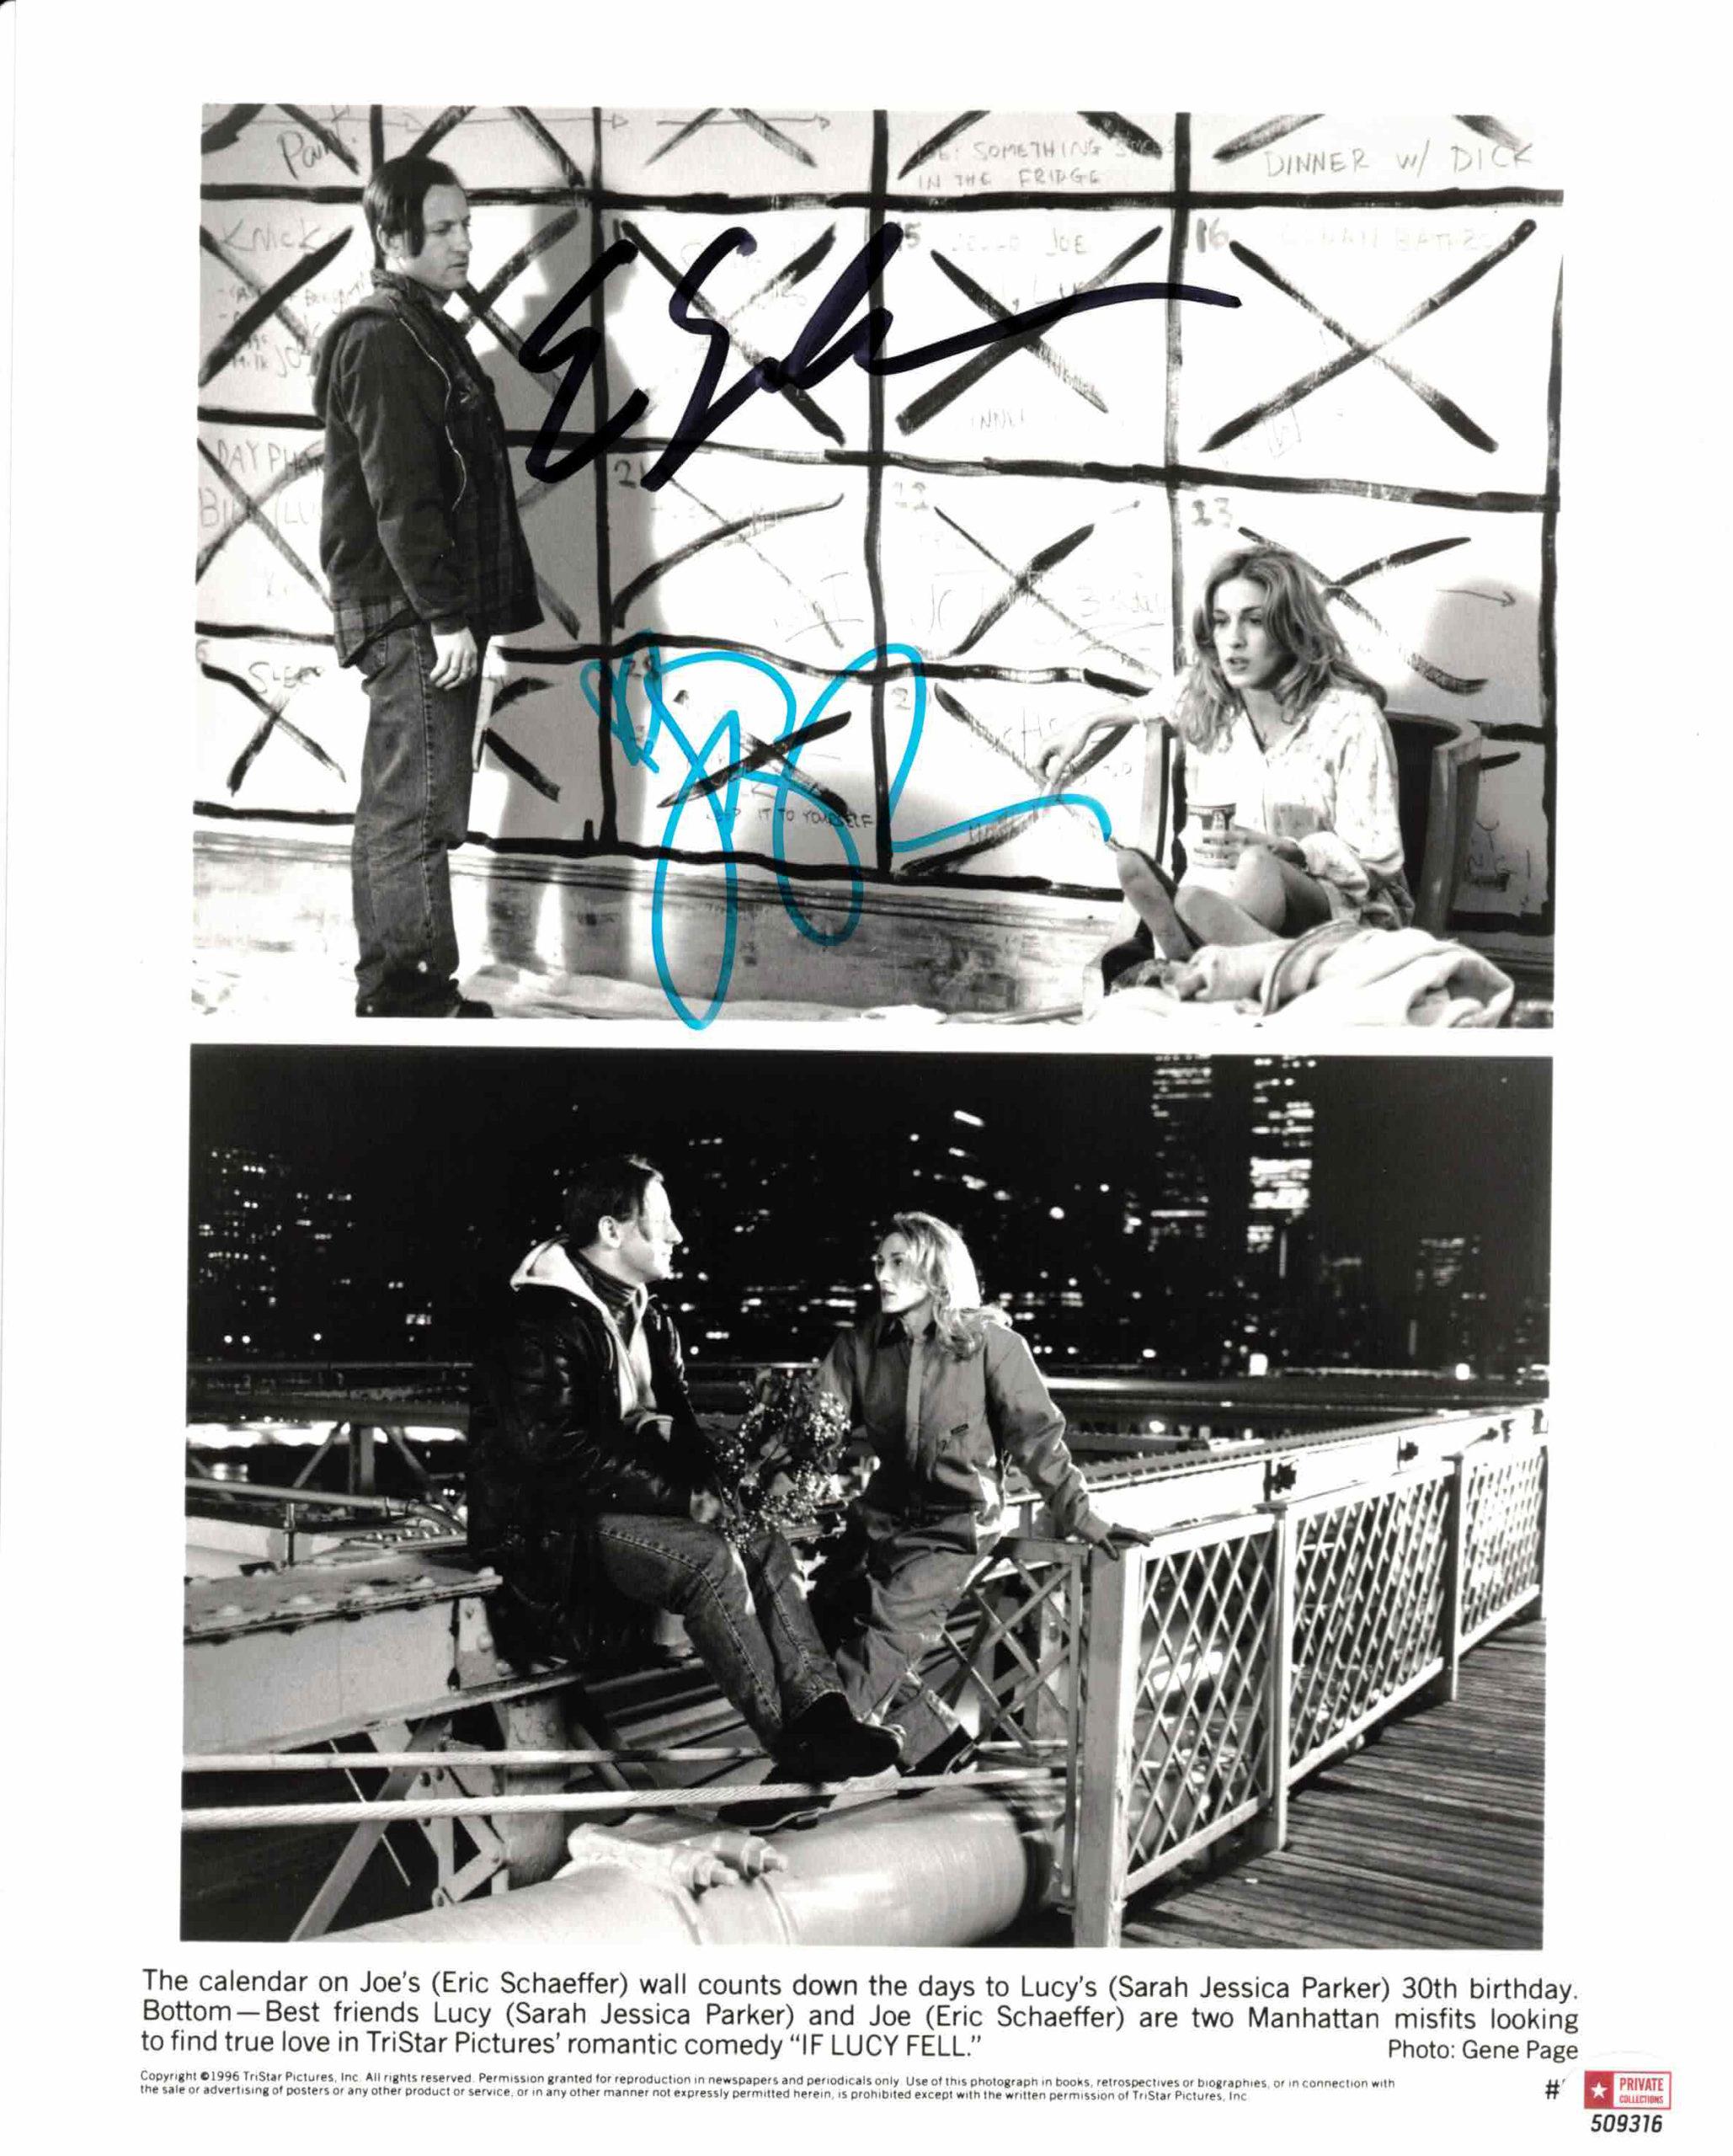 Sarah Jessica Parker & Eric Schaeffer - autogram